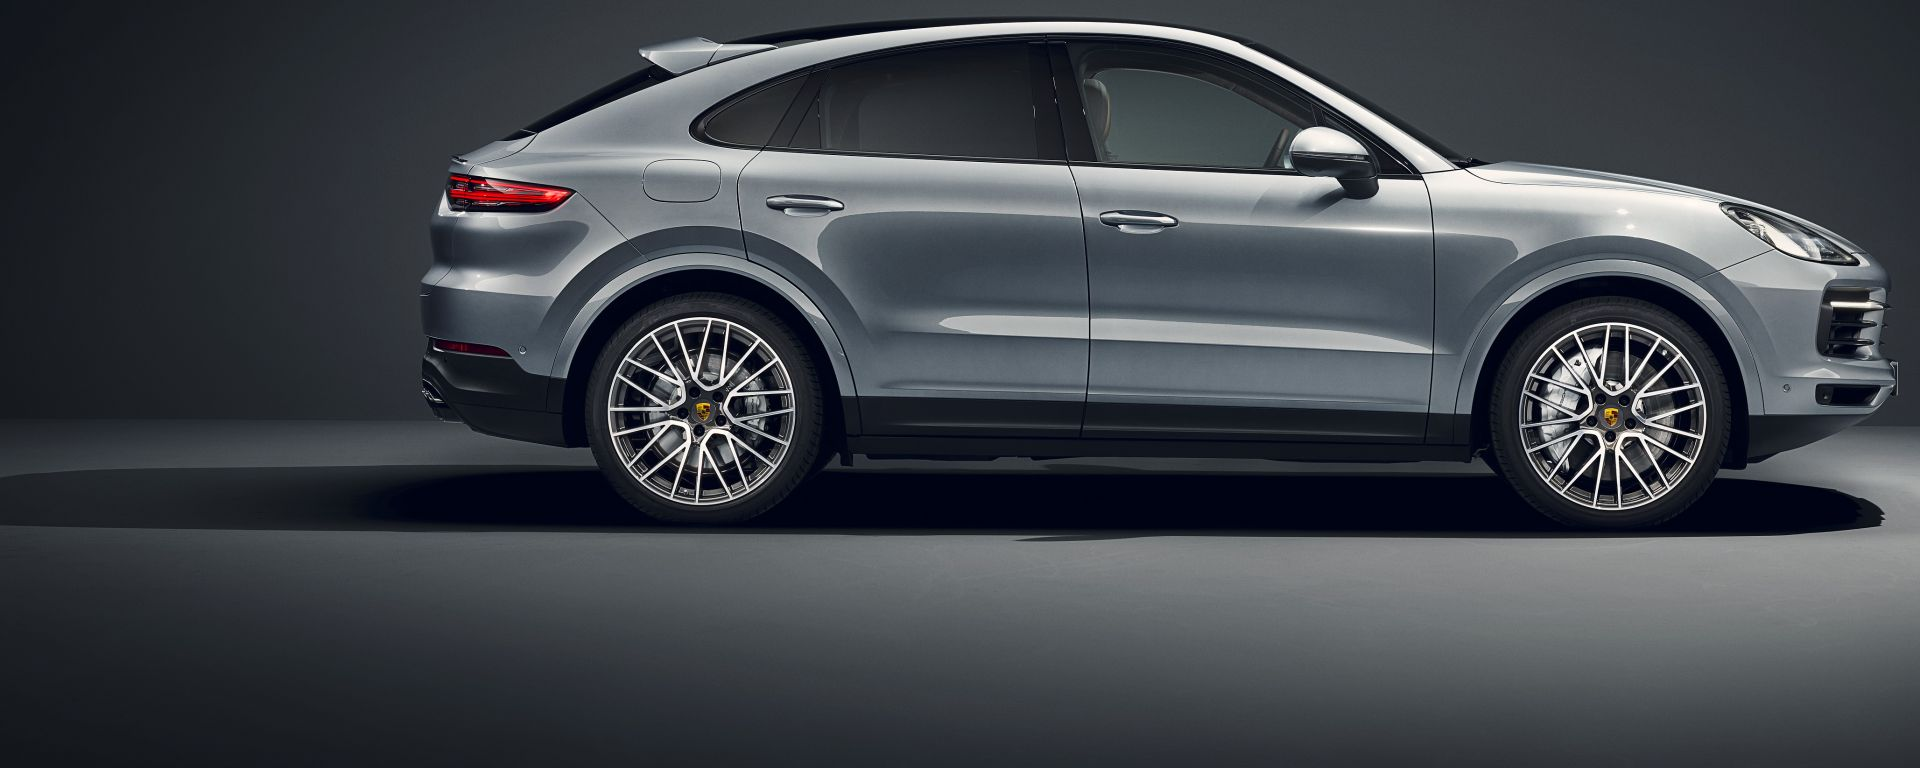 Nuova Porsche Cayenne S Coupé